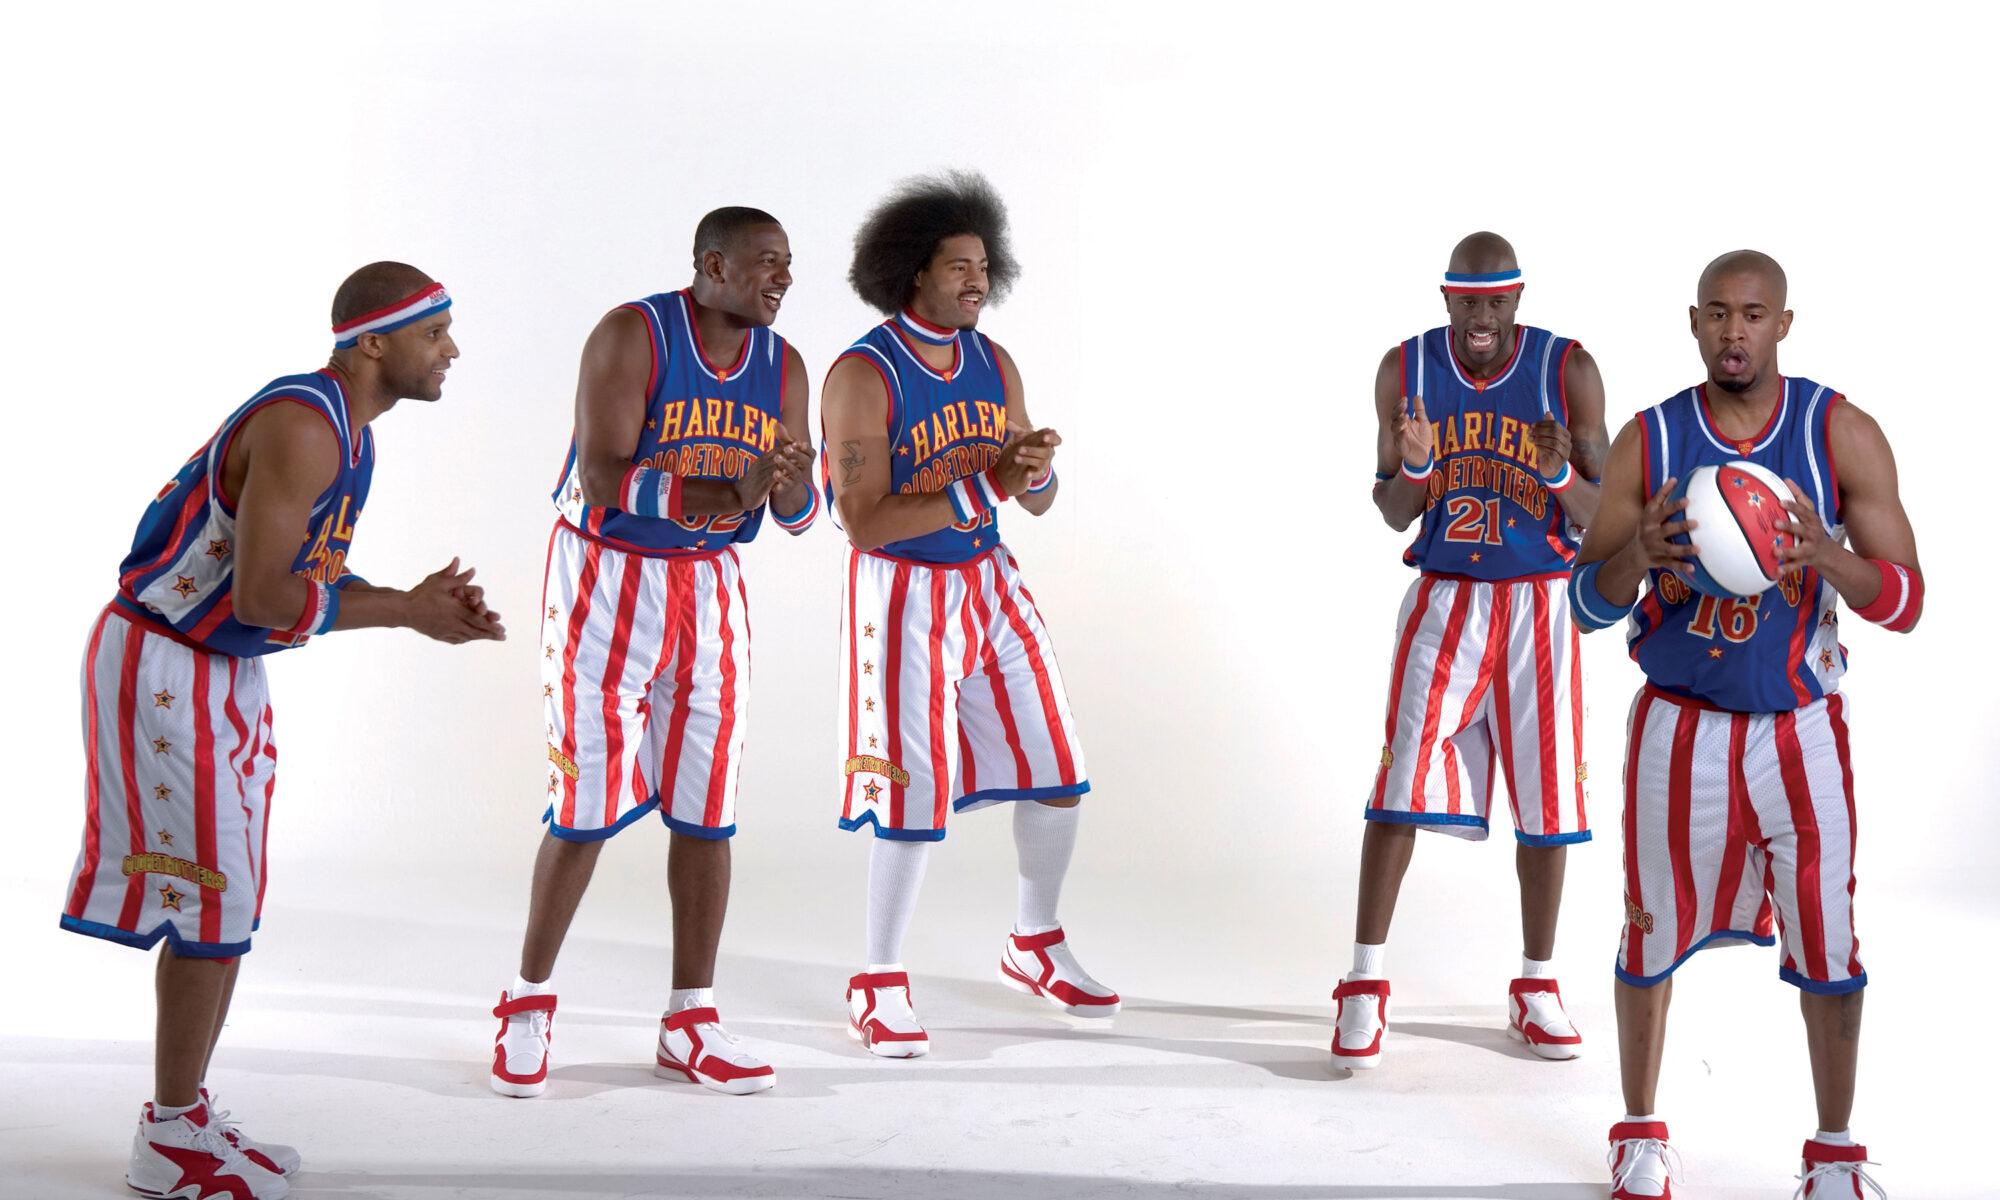 photo of 5 basketball players